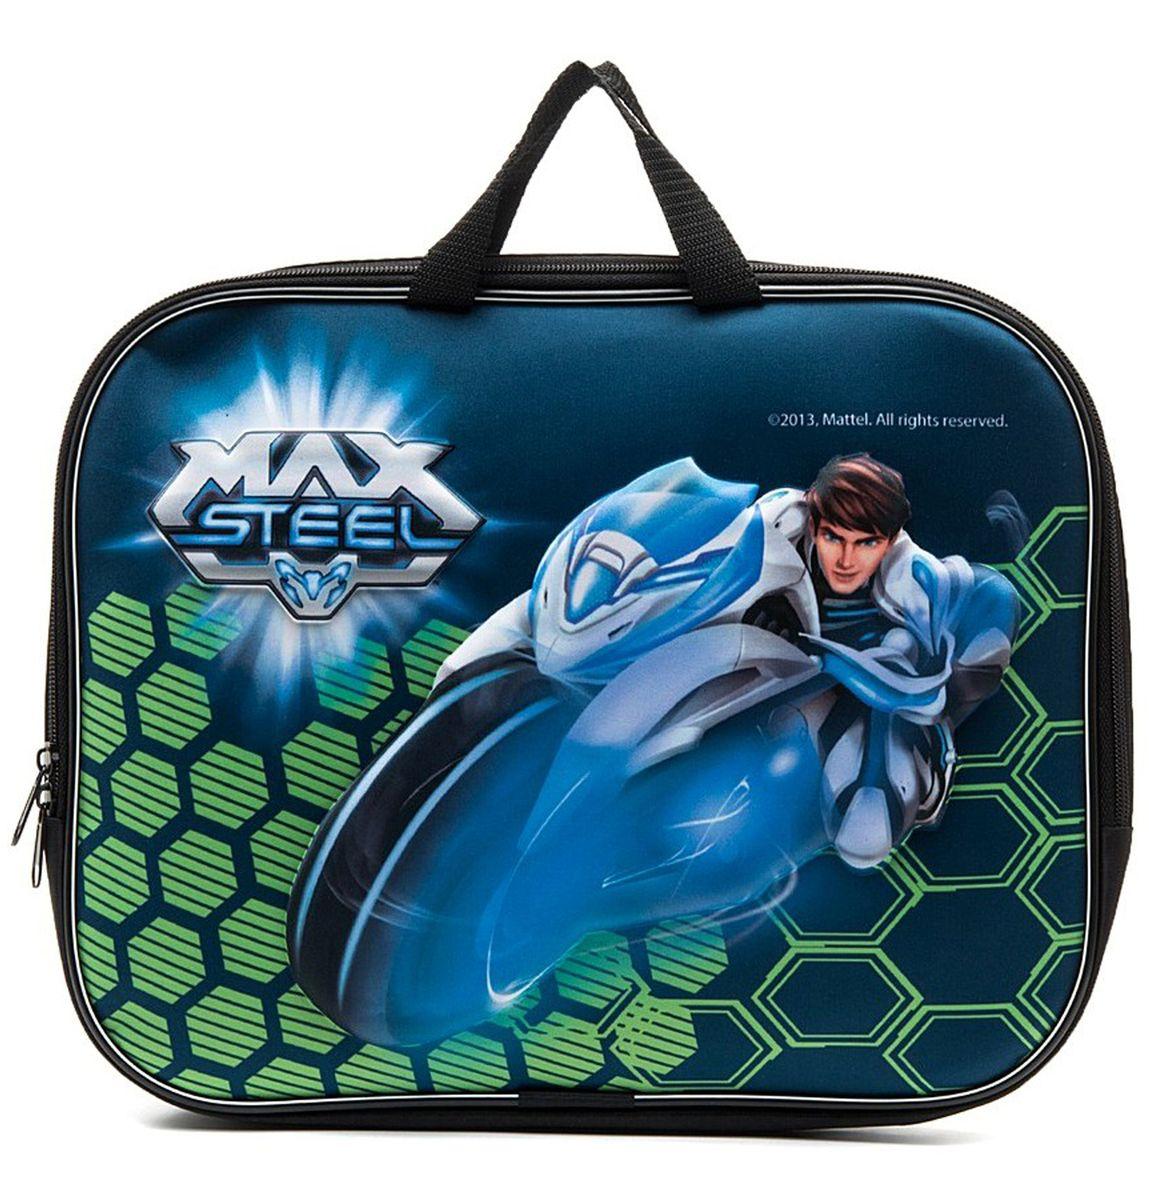 Centrum Папка-сумка 3D Max Steel 3d max